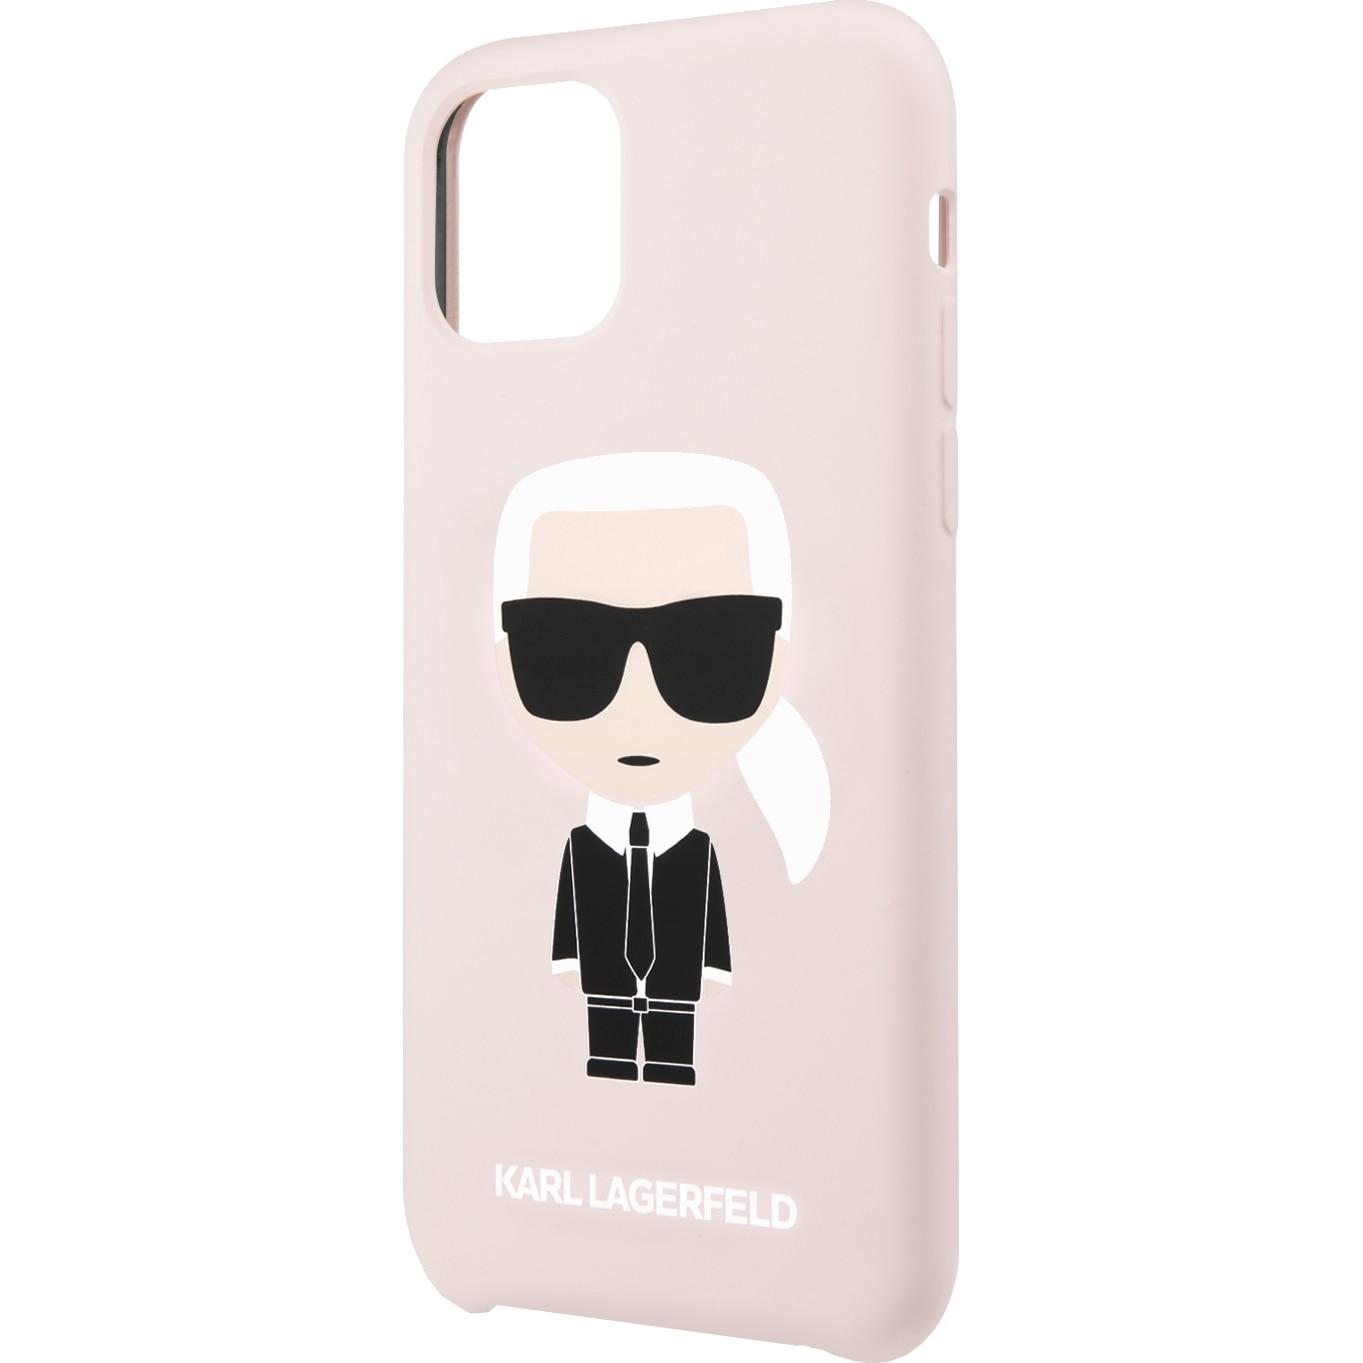 Fotografie Husa de protectie Karl Lagerfeld Iconic Silicone pentru iPhone 11 Pro, KLHCN58SLFKPI, Pink